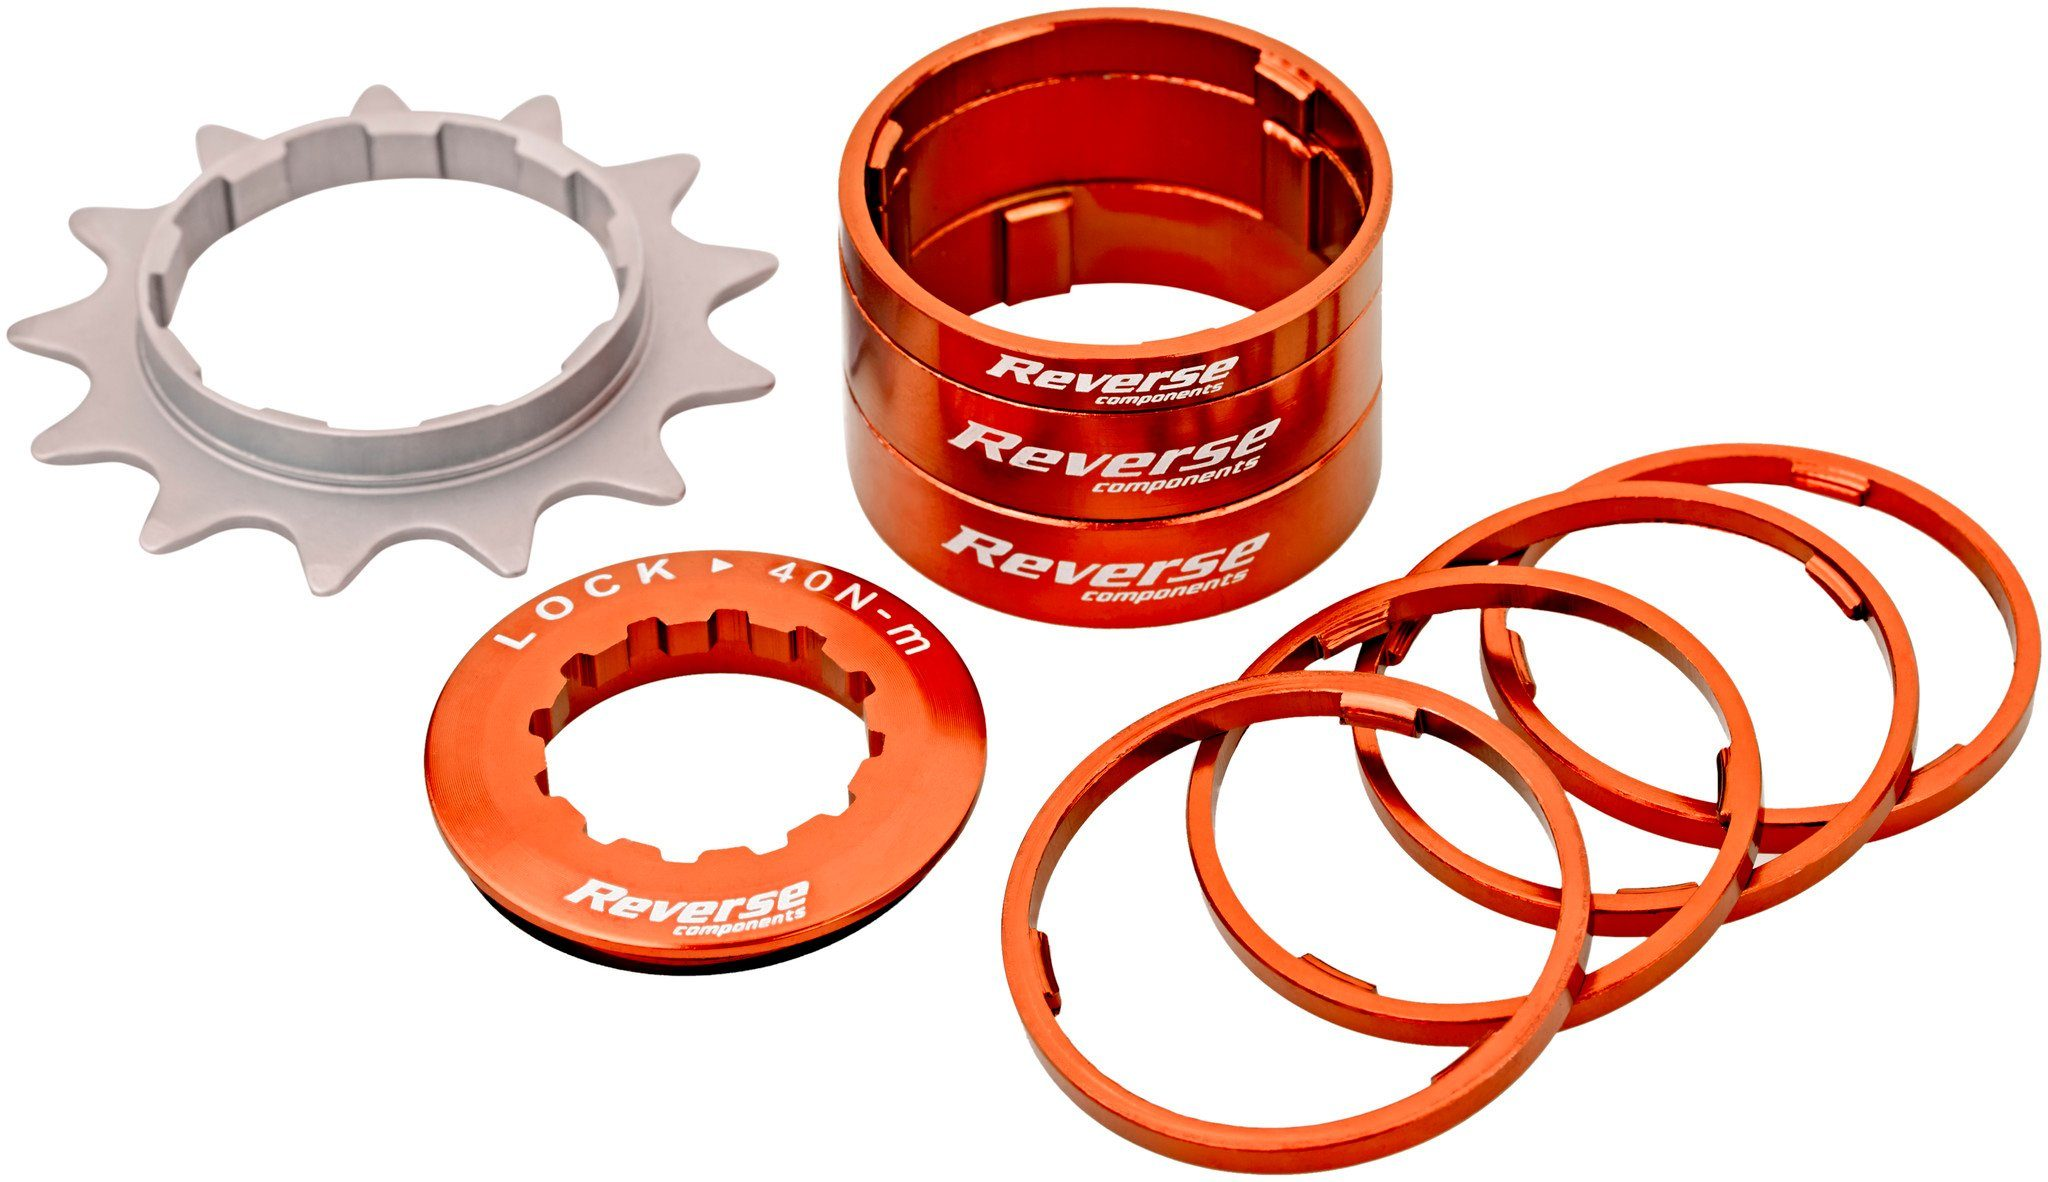 Reverse Fahrradkasetten »Single Speed Kit«